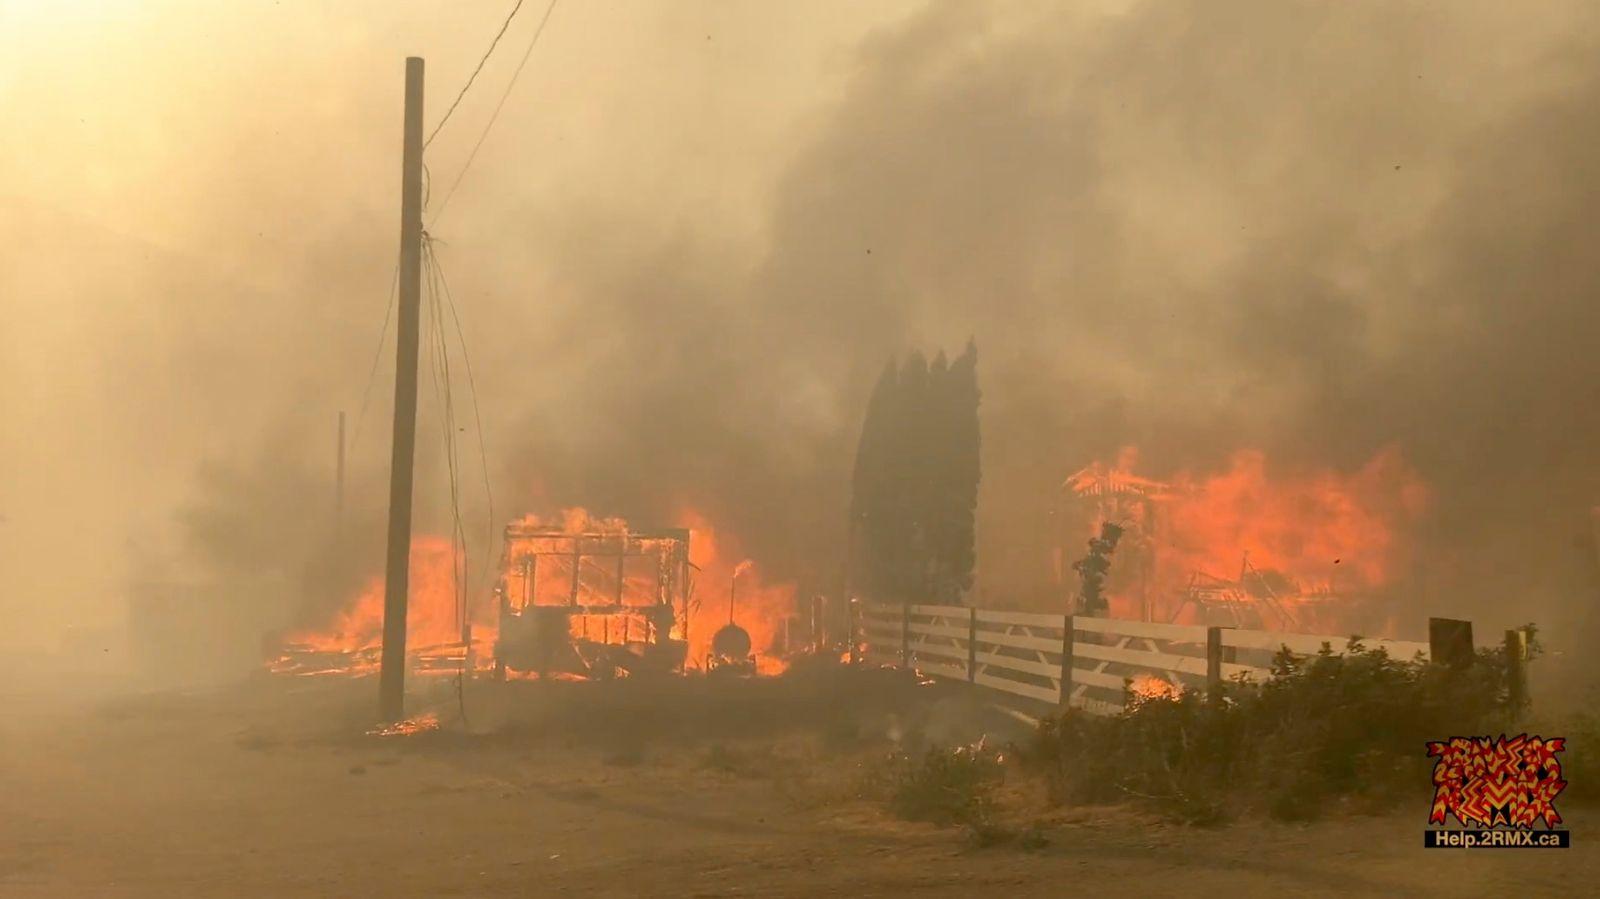 Wildfire in Lytton, British Columbia